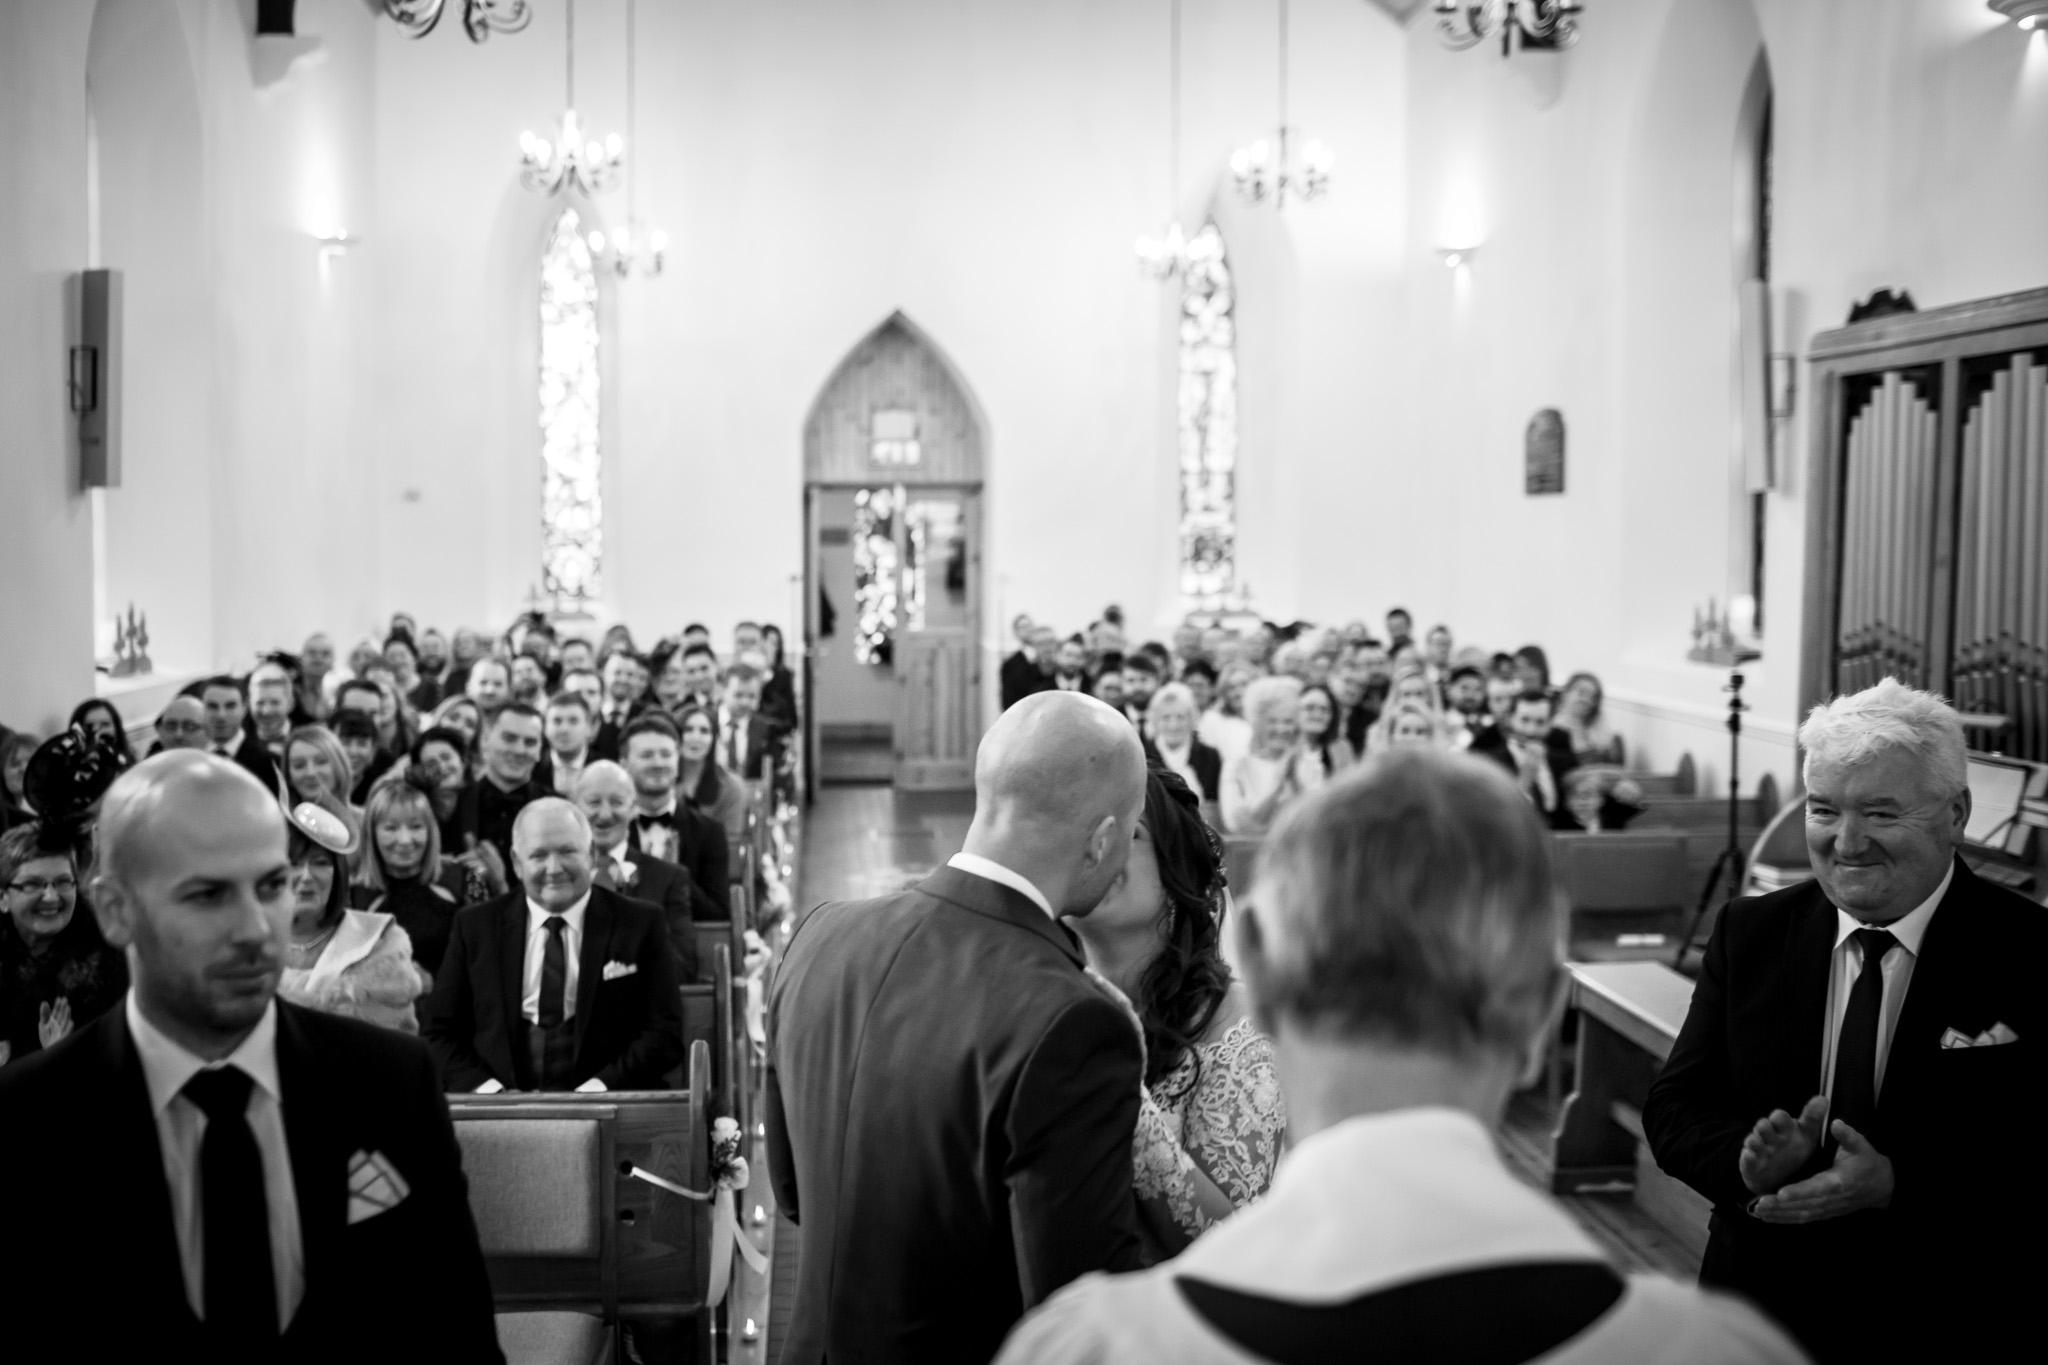 Mark_Barnes_Northern_Ireland_wedding_photographer_Harveys_Point_Donegall_Wedding_photography-Adam&Gemma-24.jpg